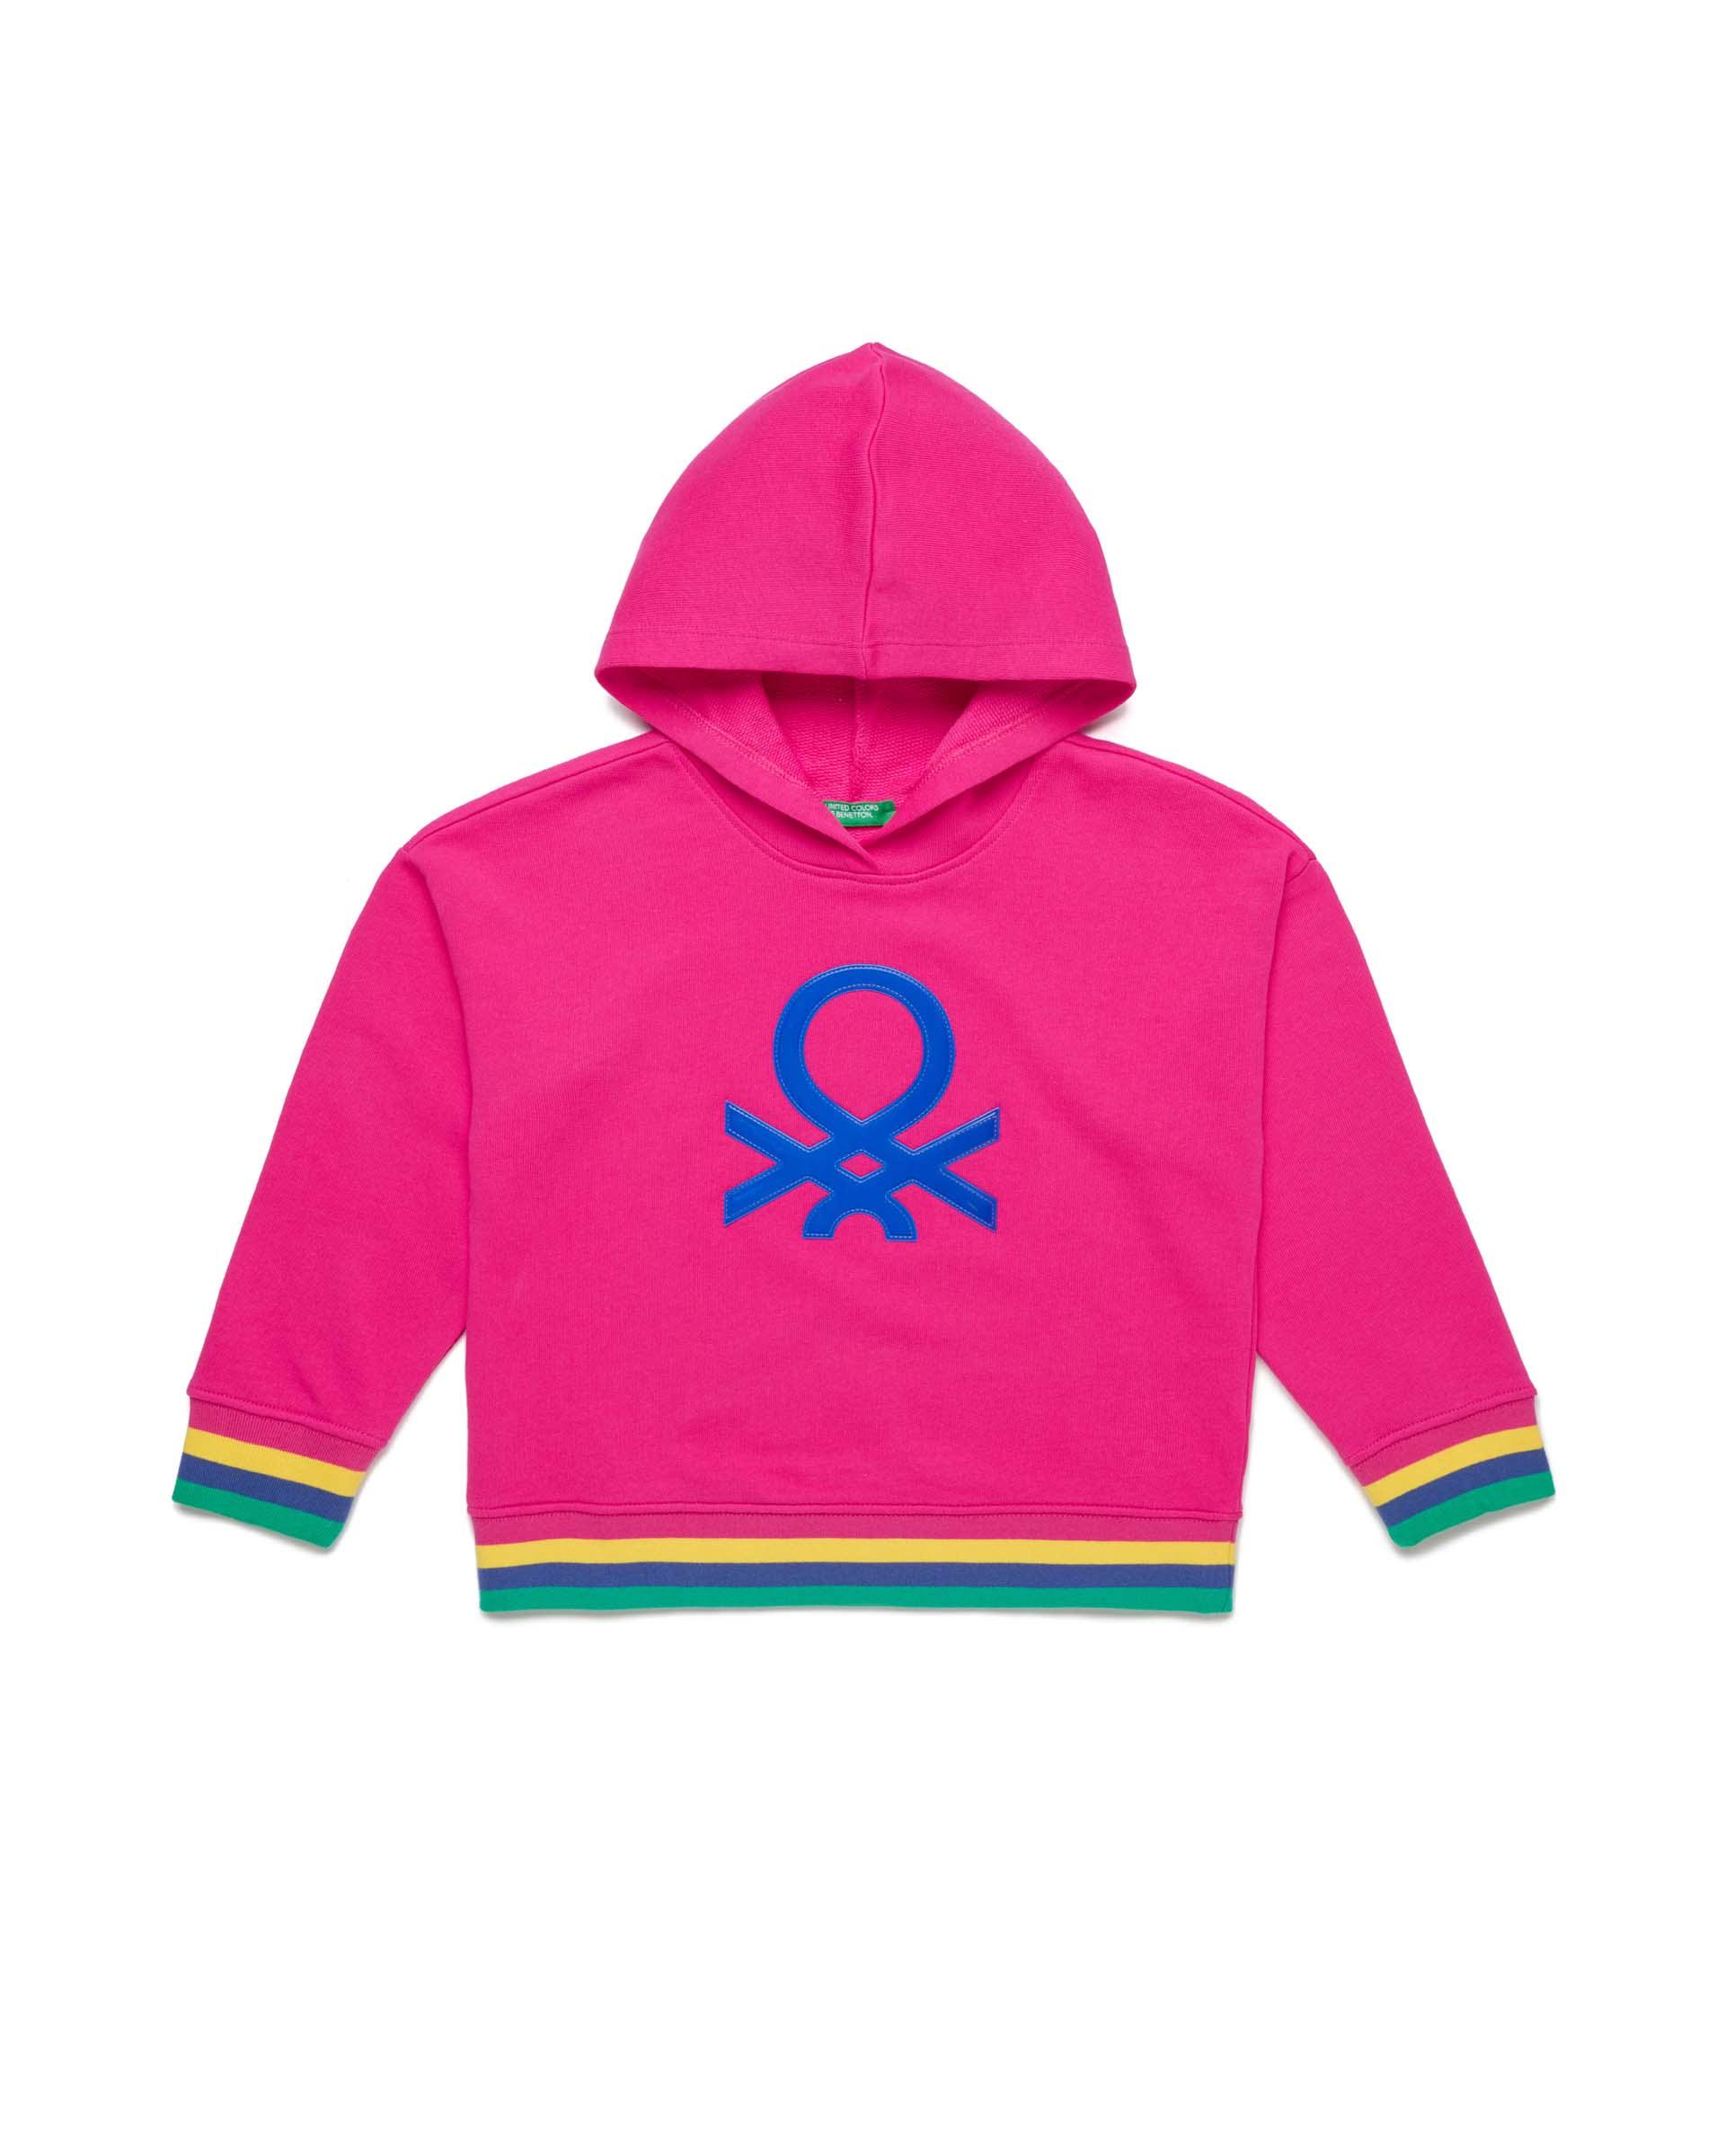 Купить 20P_3J68C2175_2L3, Толстовка для девочек Benetton 3J68C2175_2L3 р-р 152, United Colors of Benetton, Толстовки для девочек